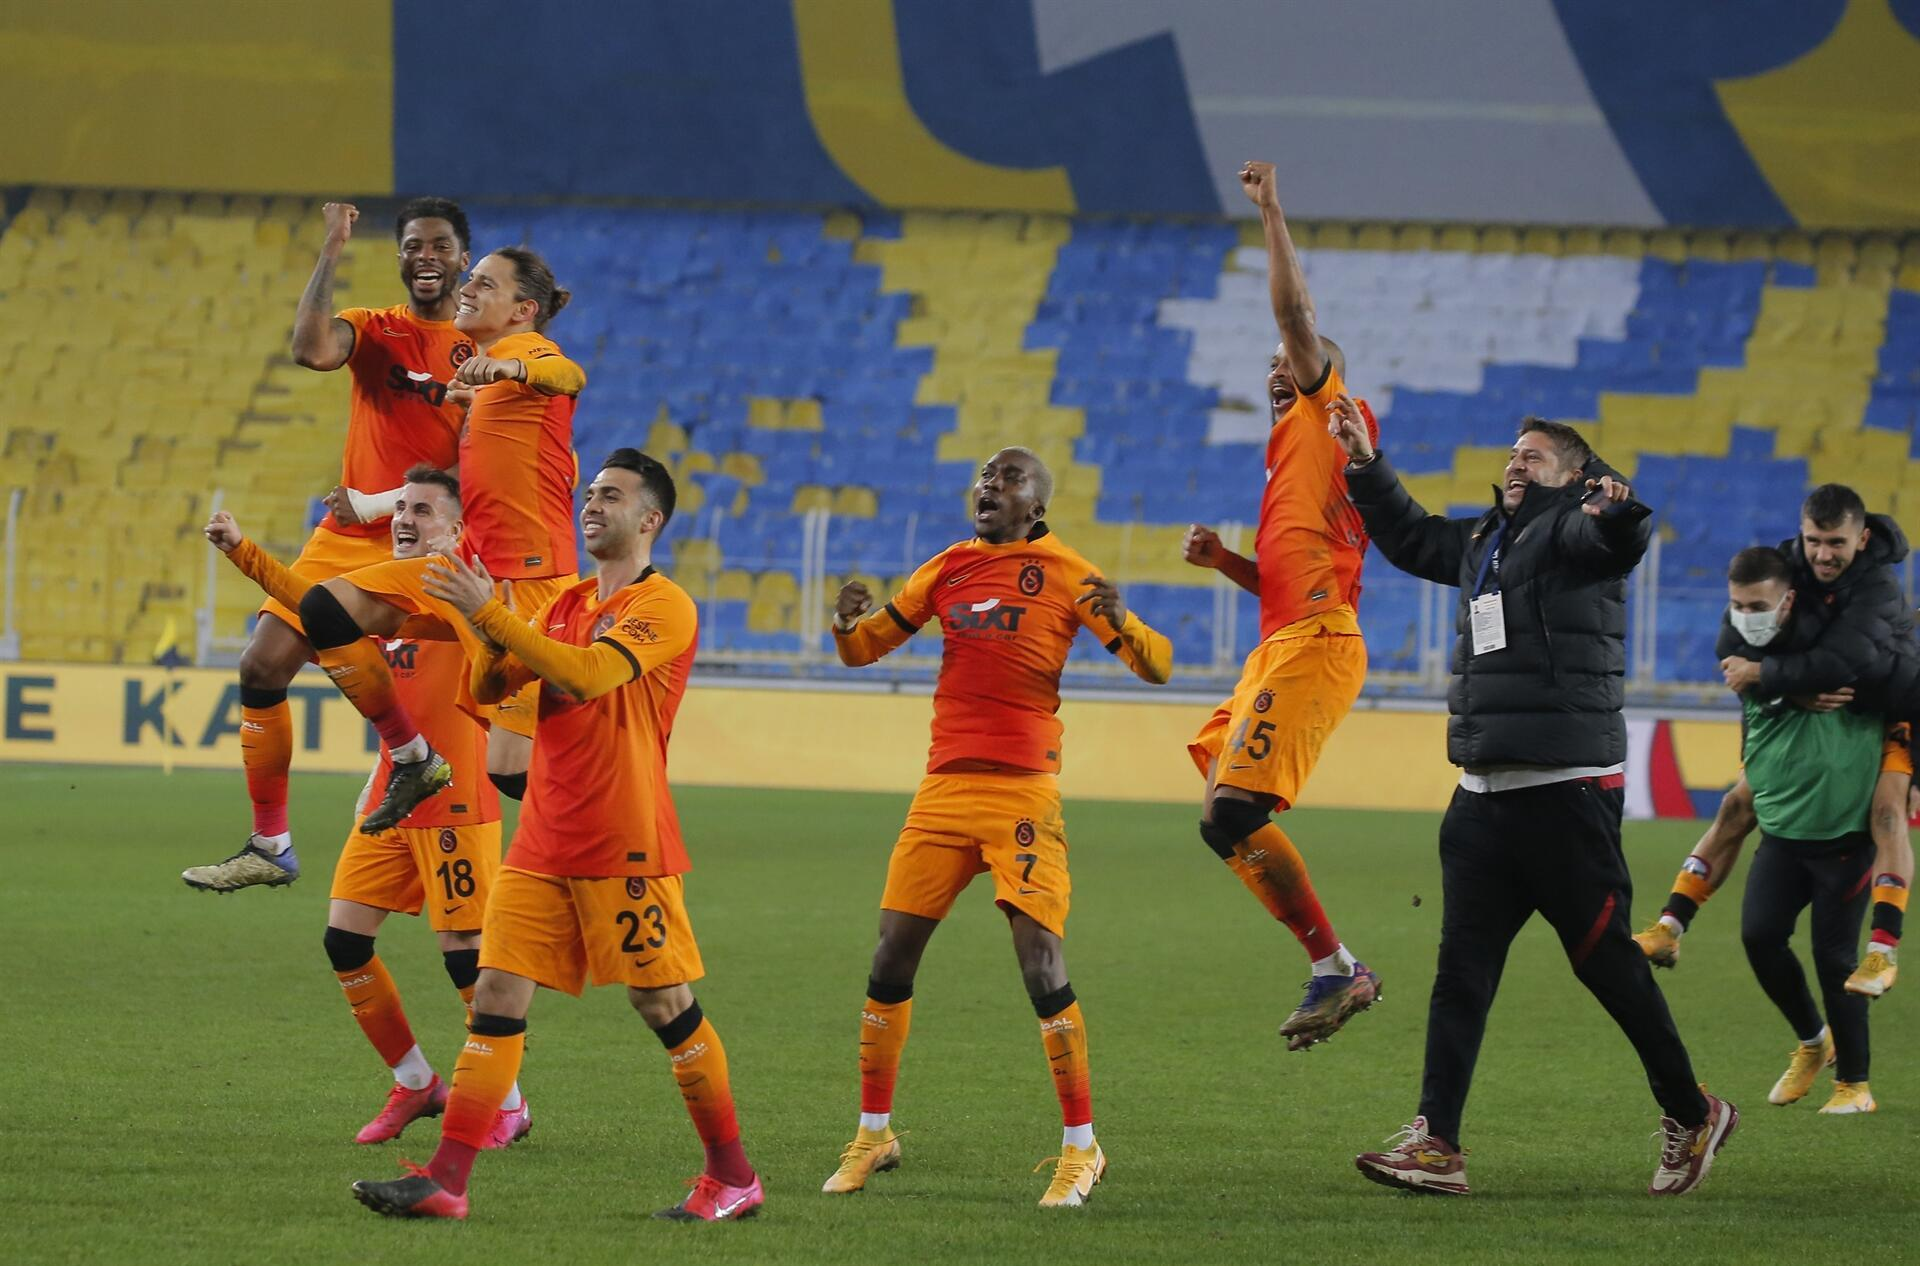 Galatasaray saatte Benarbahos'u 1-0 yendi.